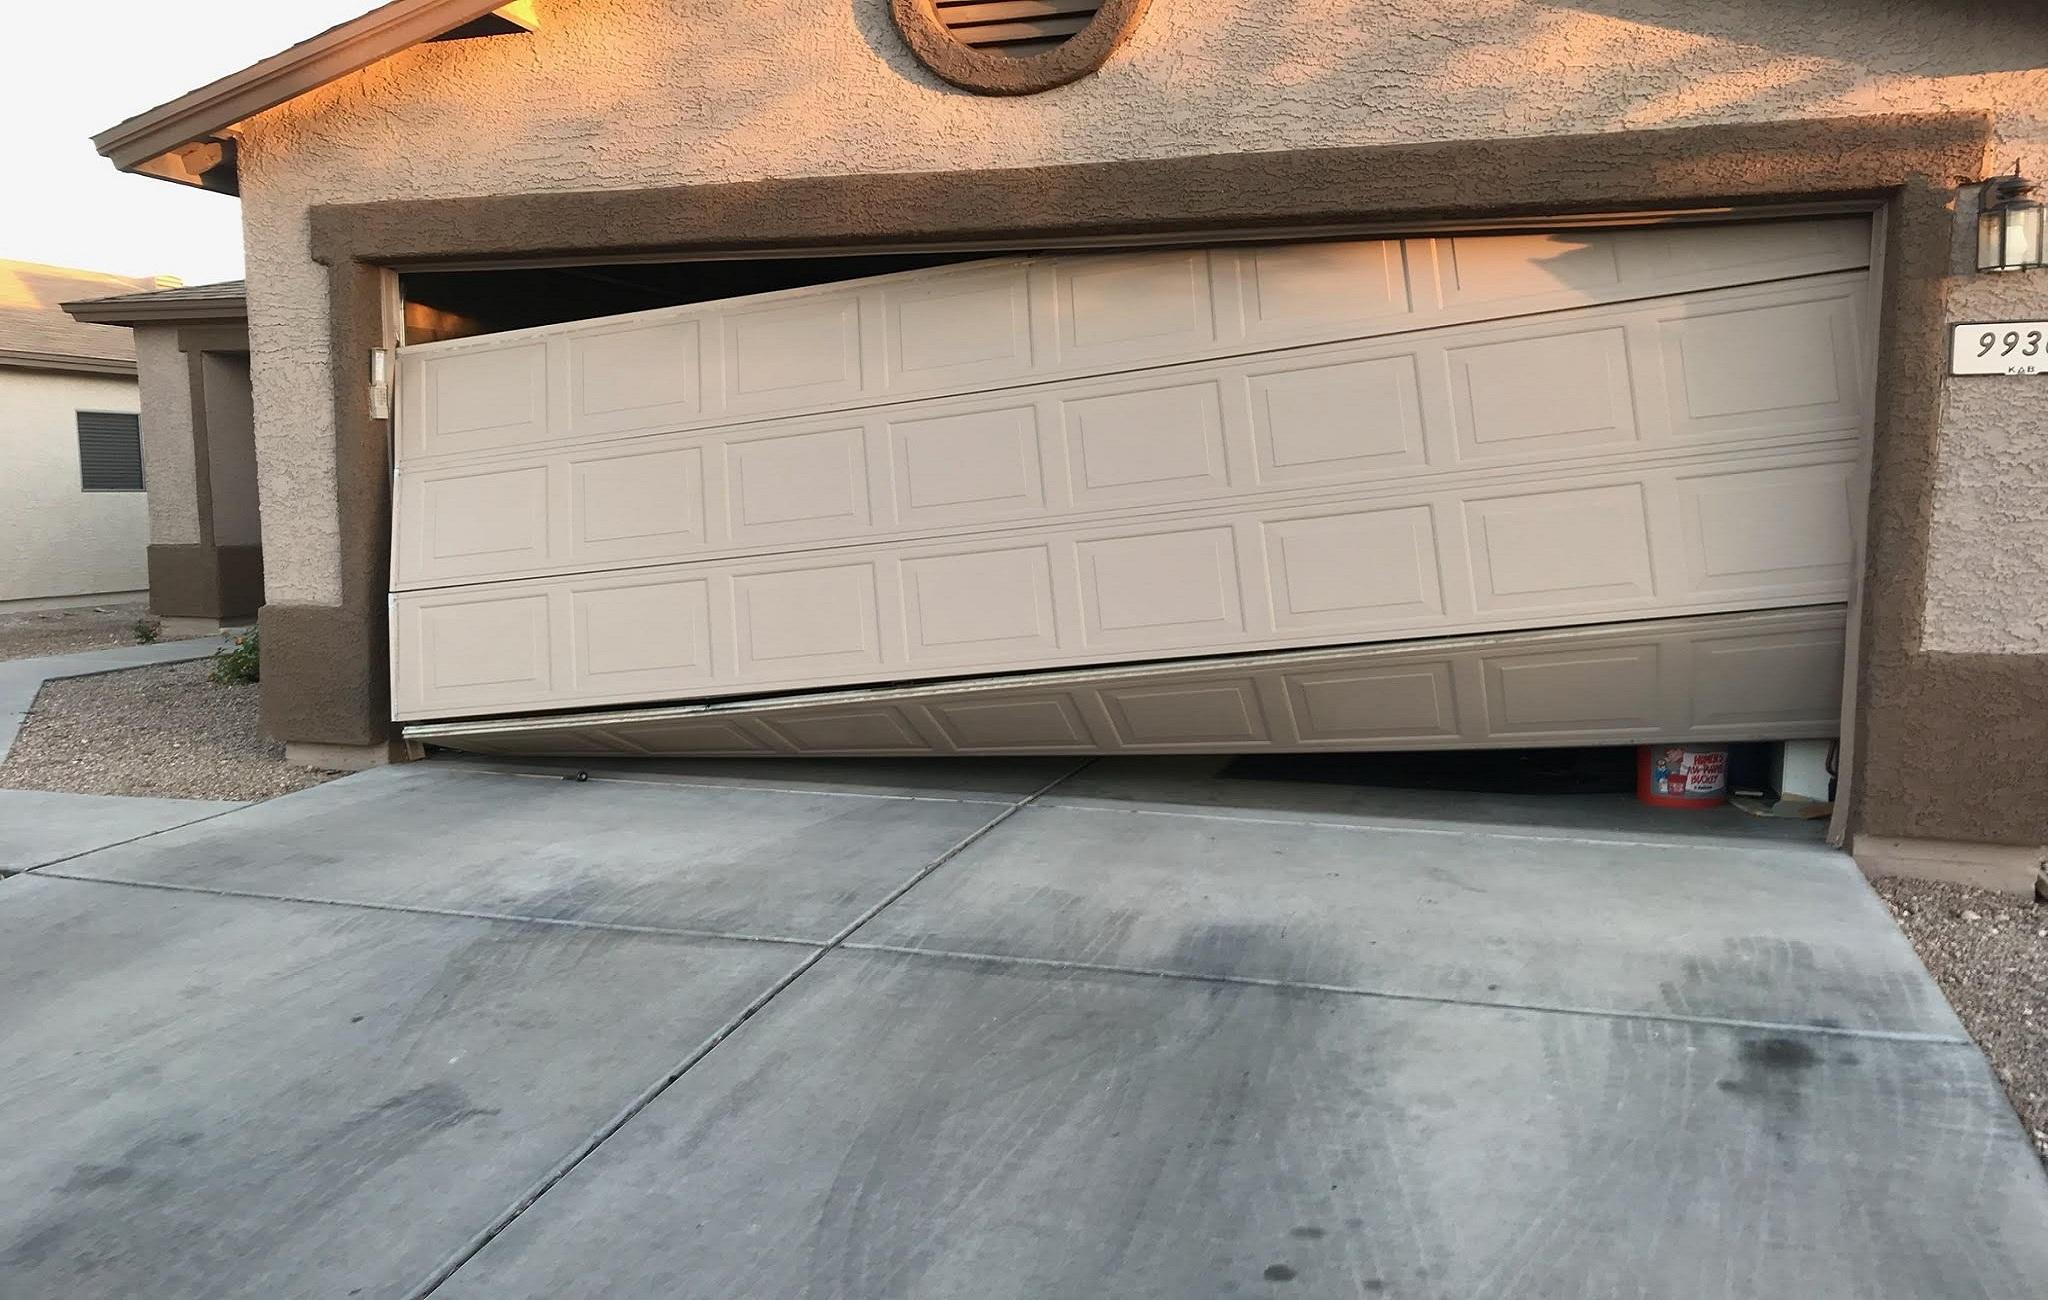 My Garage Door is Damaged, Can it Repair it Myself?